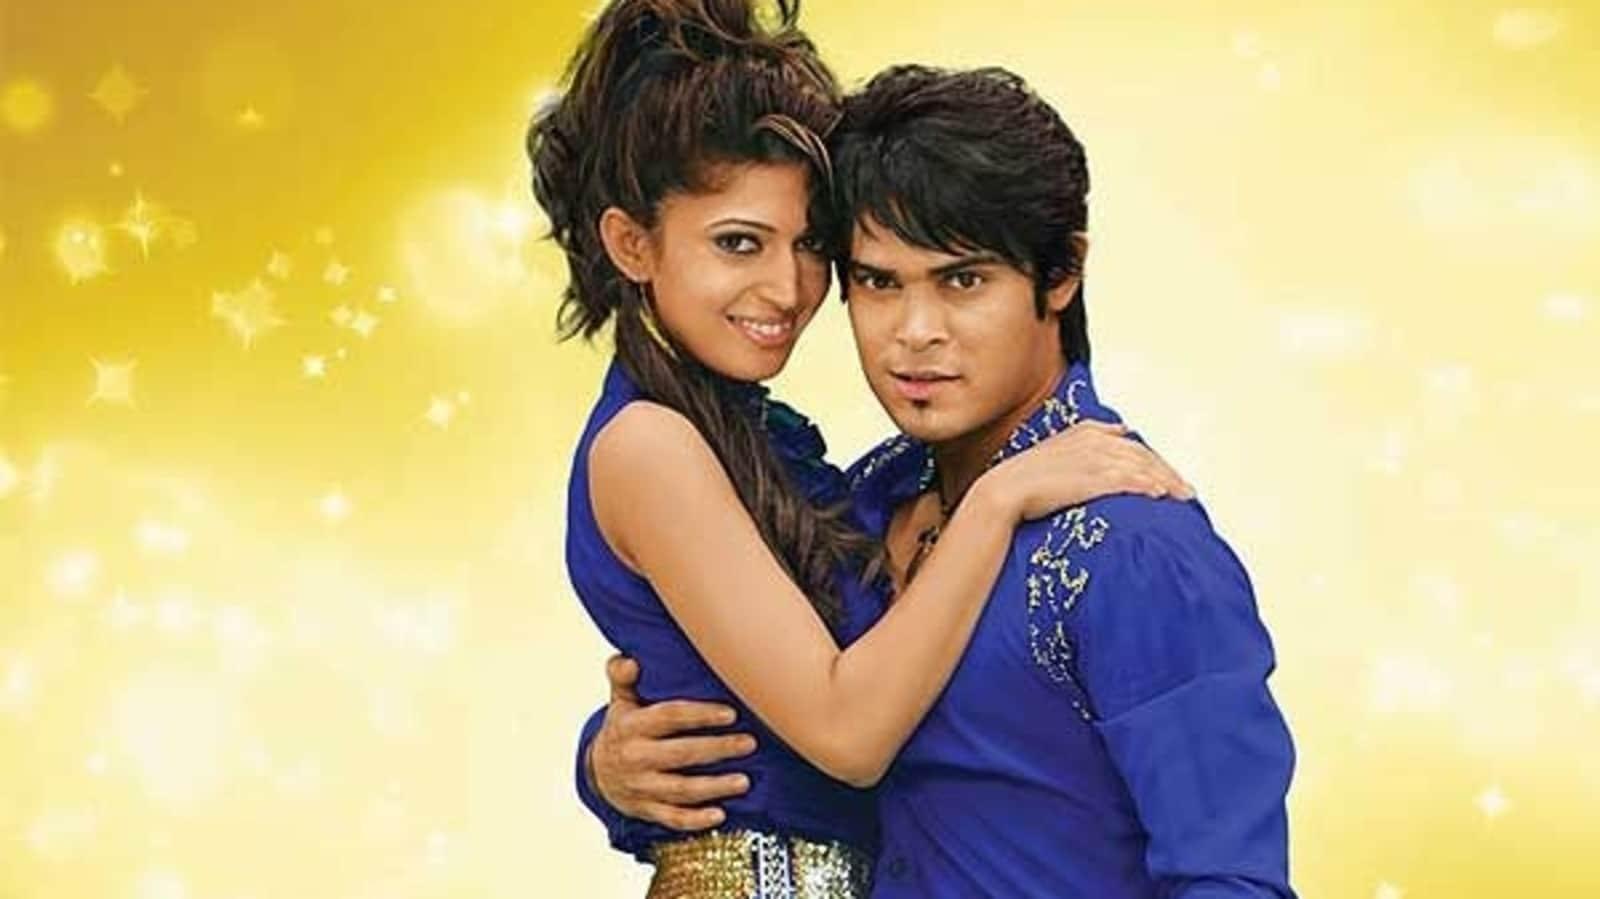 Shakti mohan and kunwar amar relationship